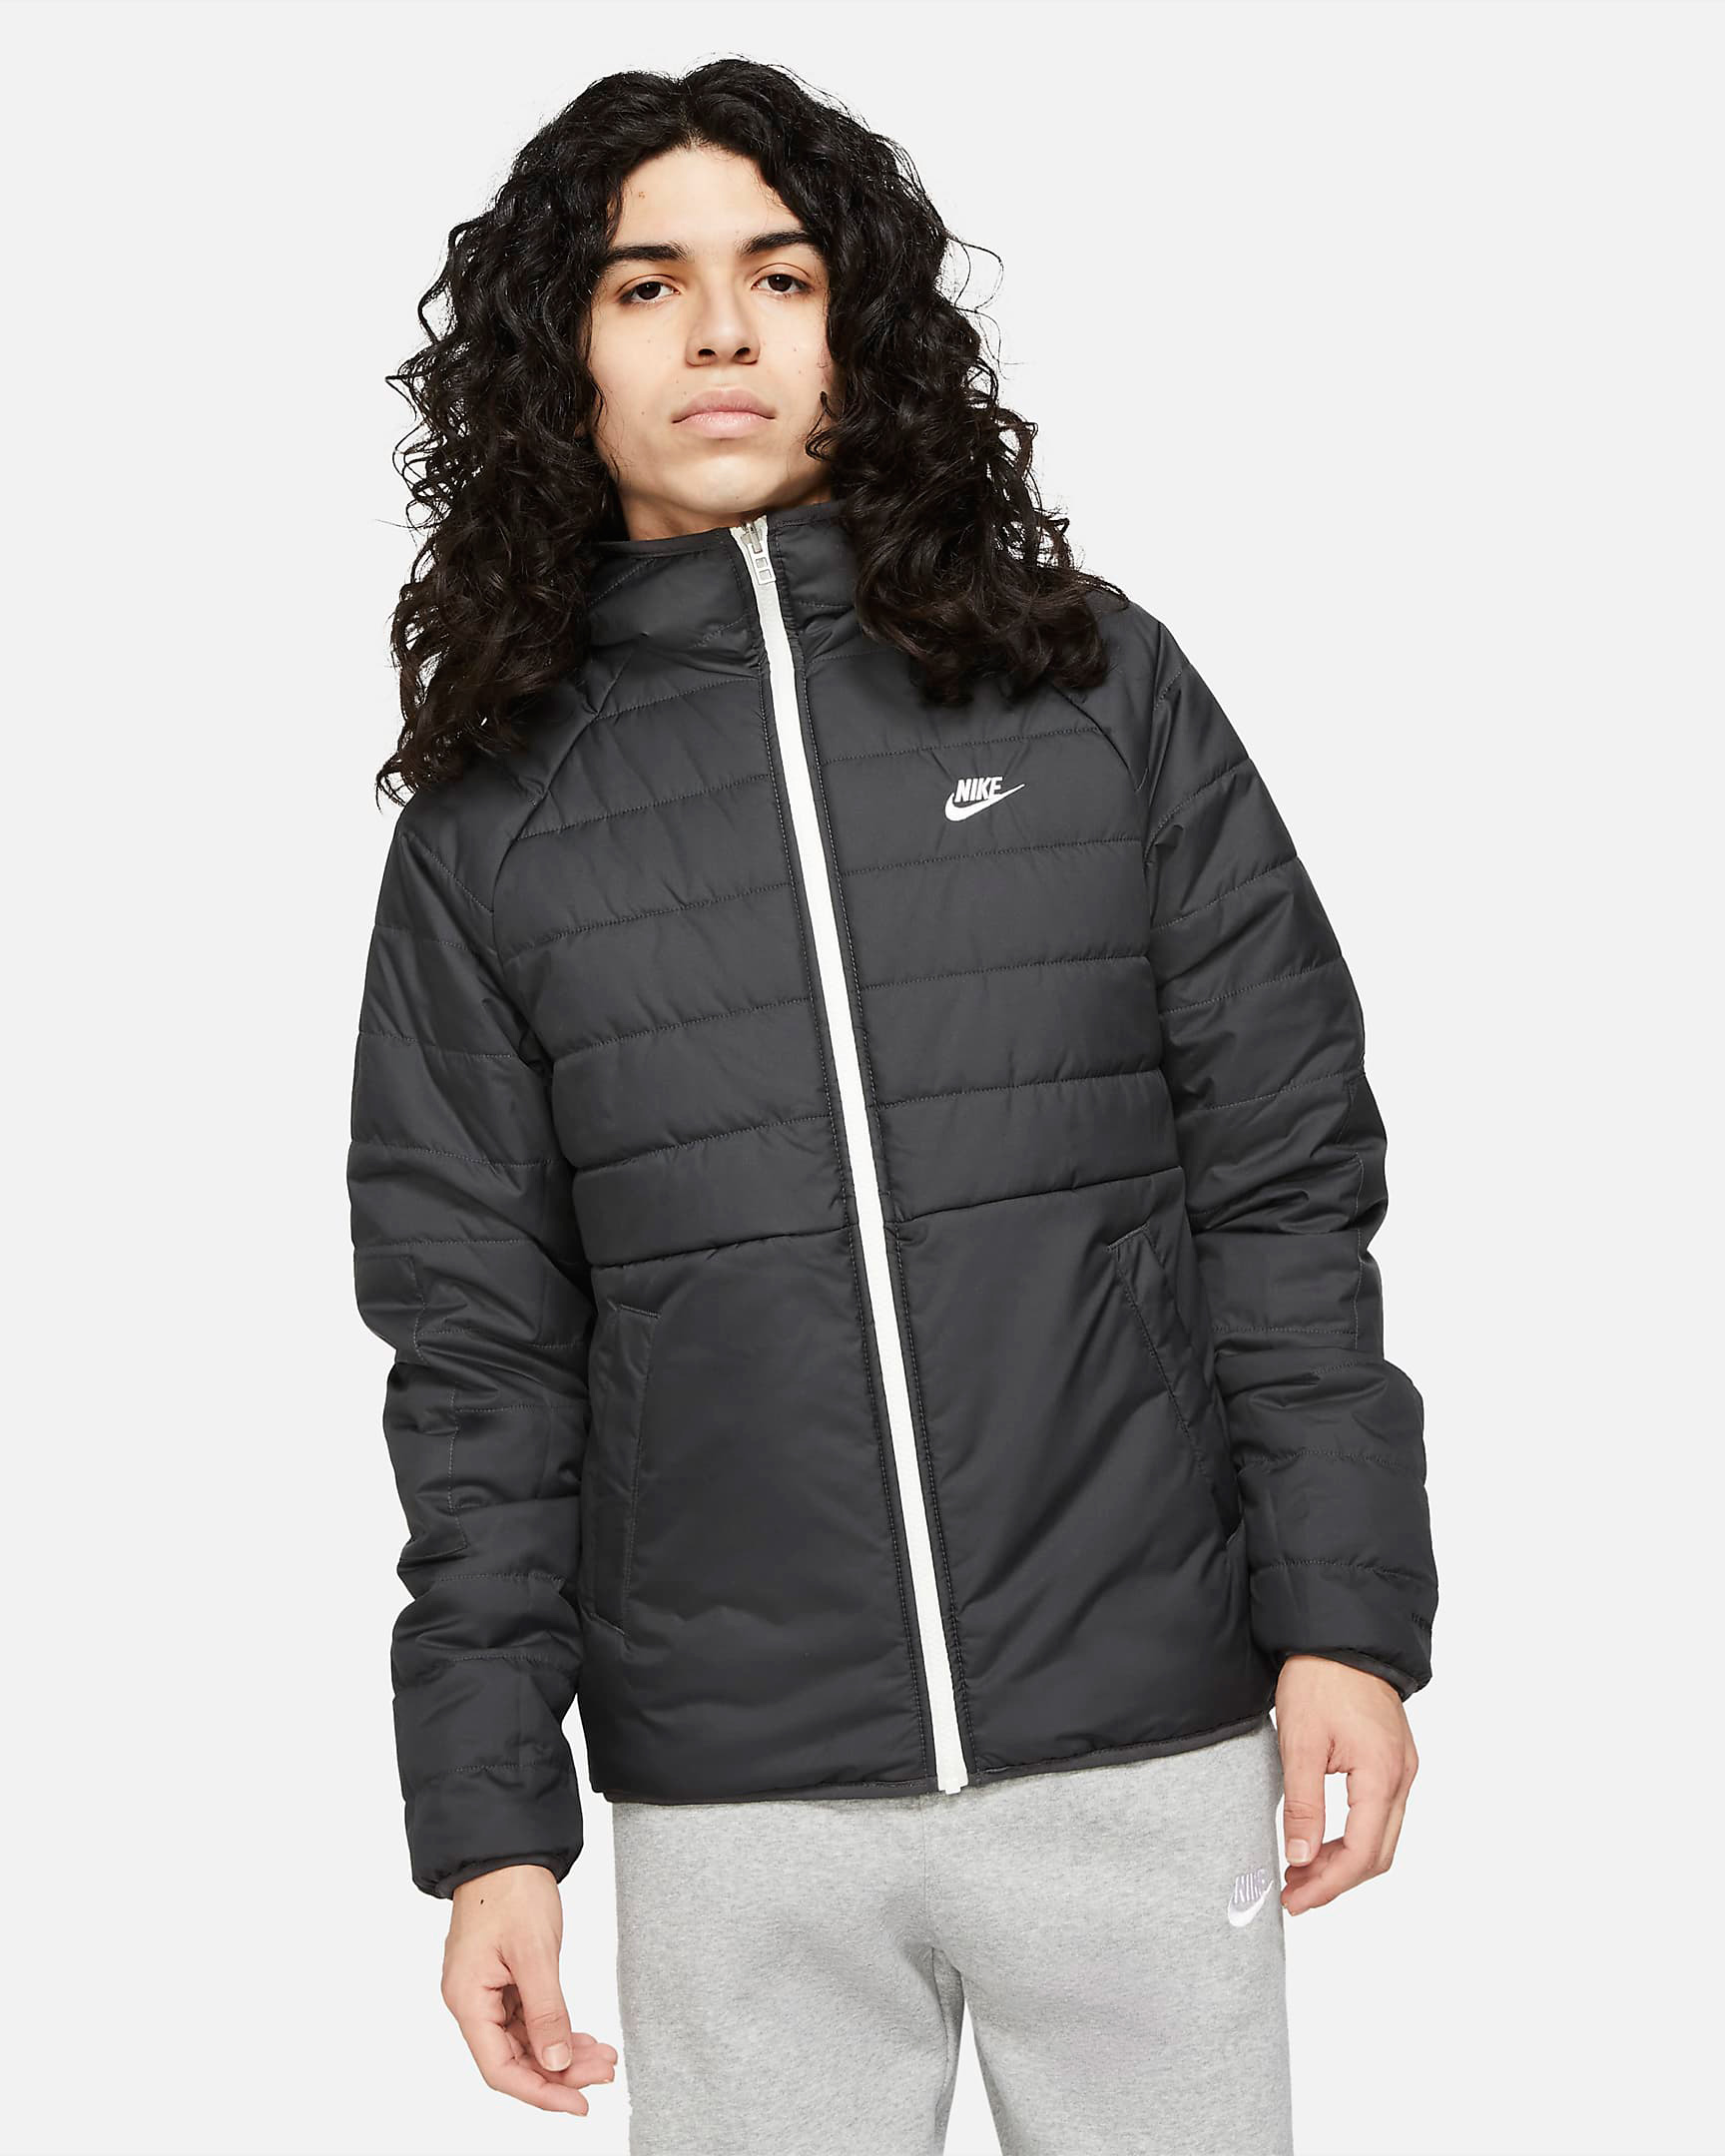 nike-sportswear-therma-fit-legacy-reversible-hooded-jacket-black-sail-1